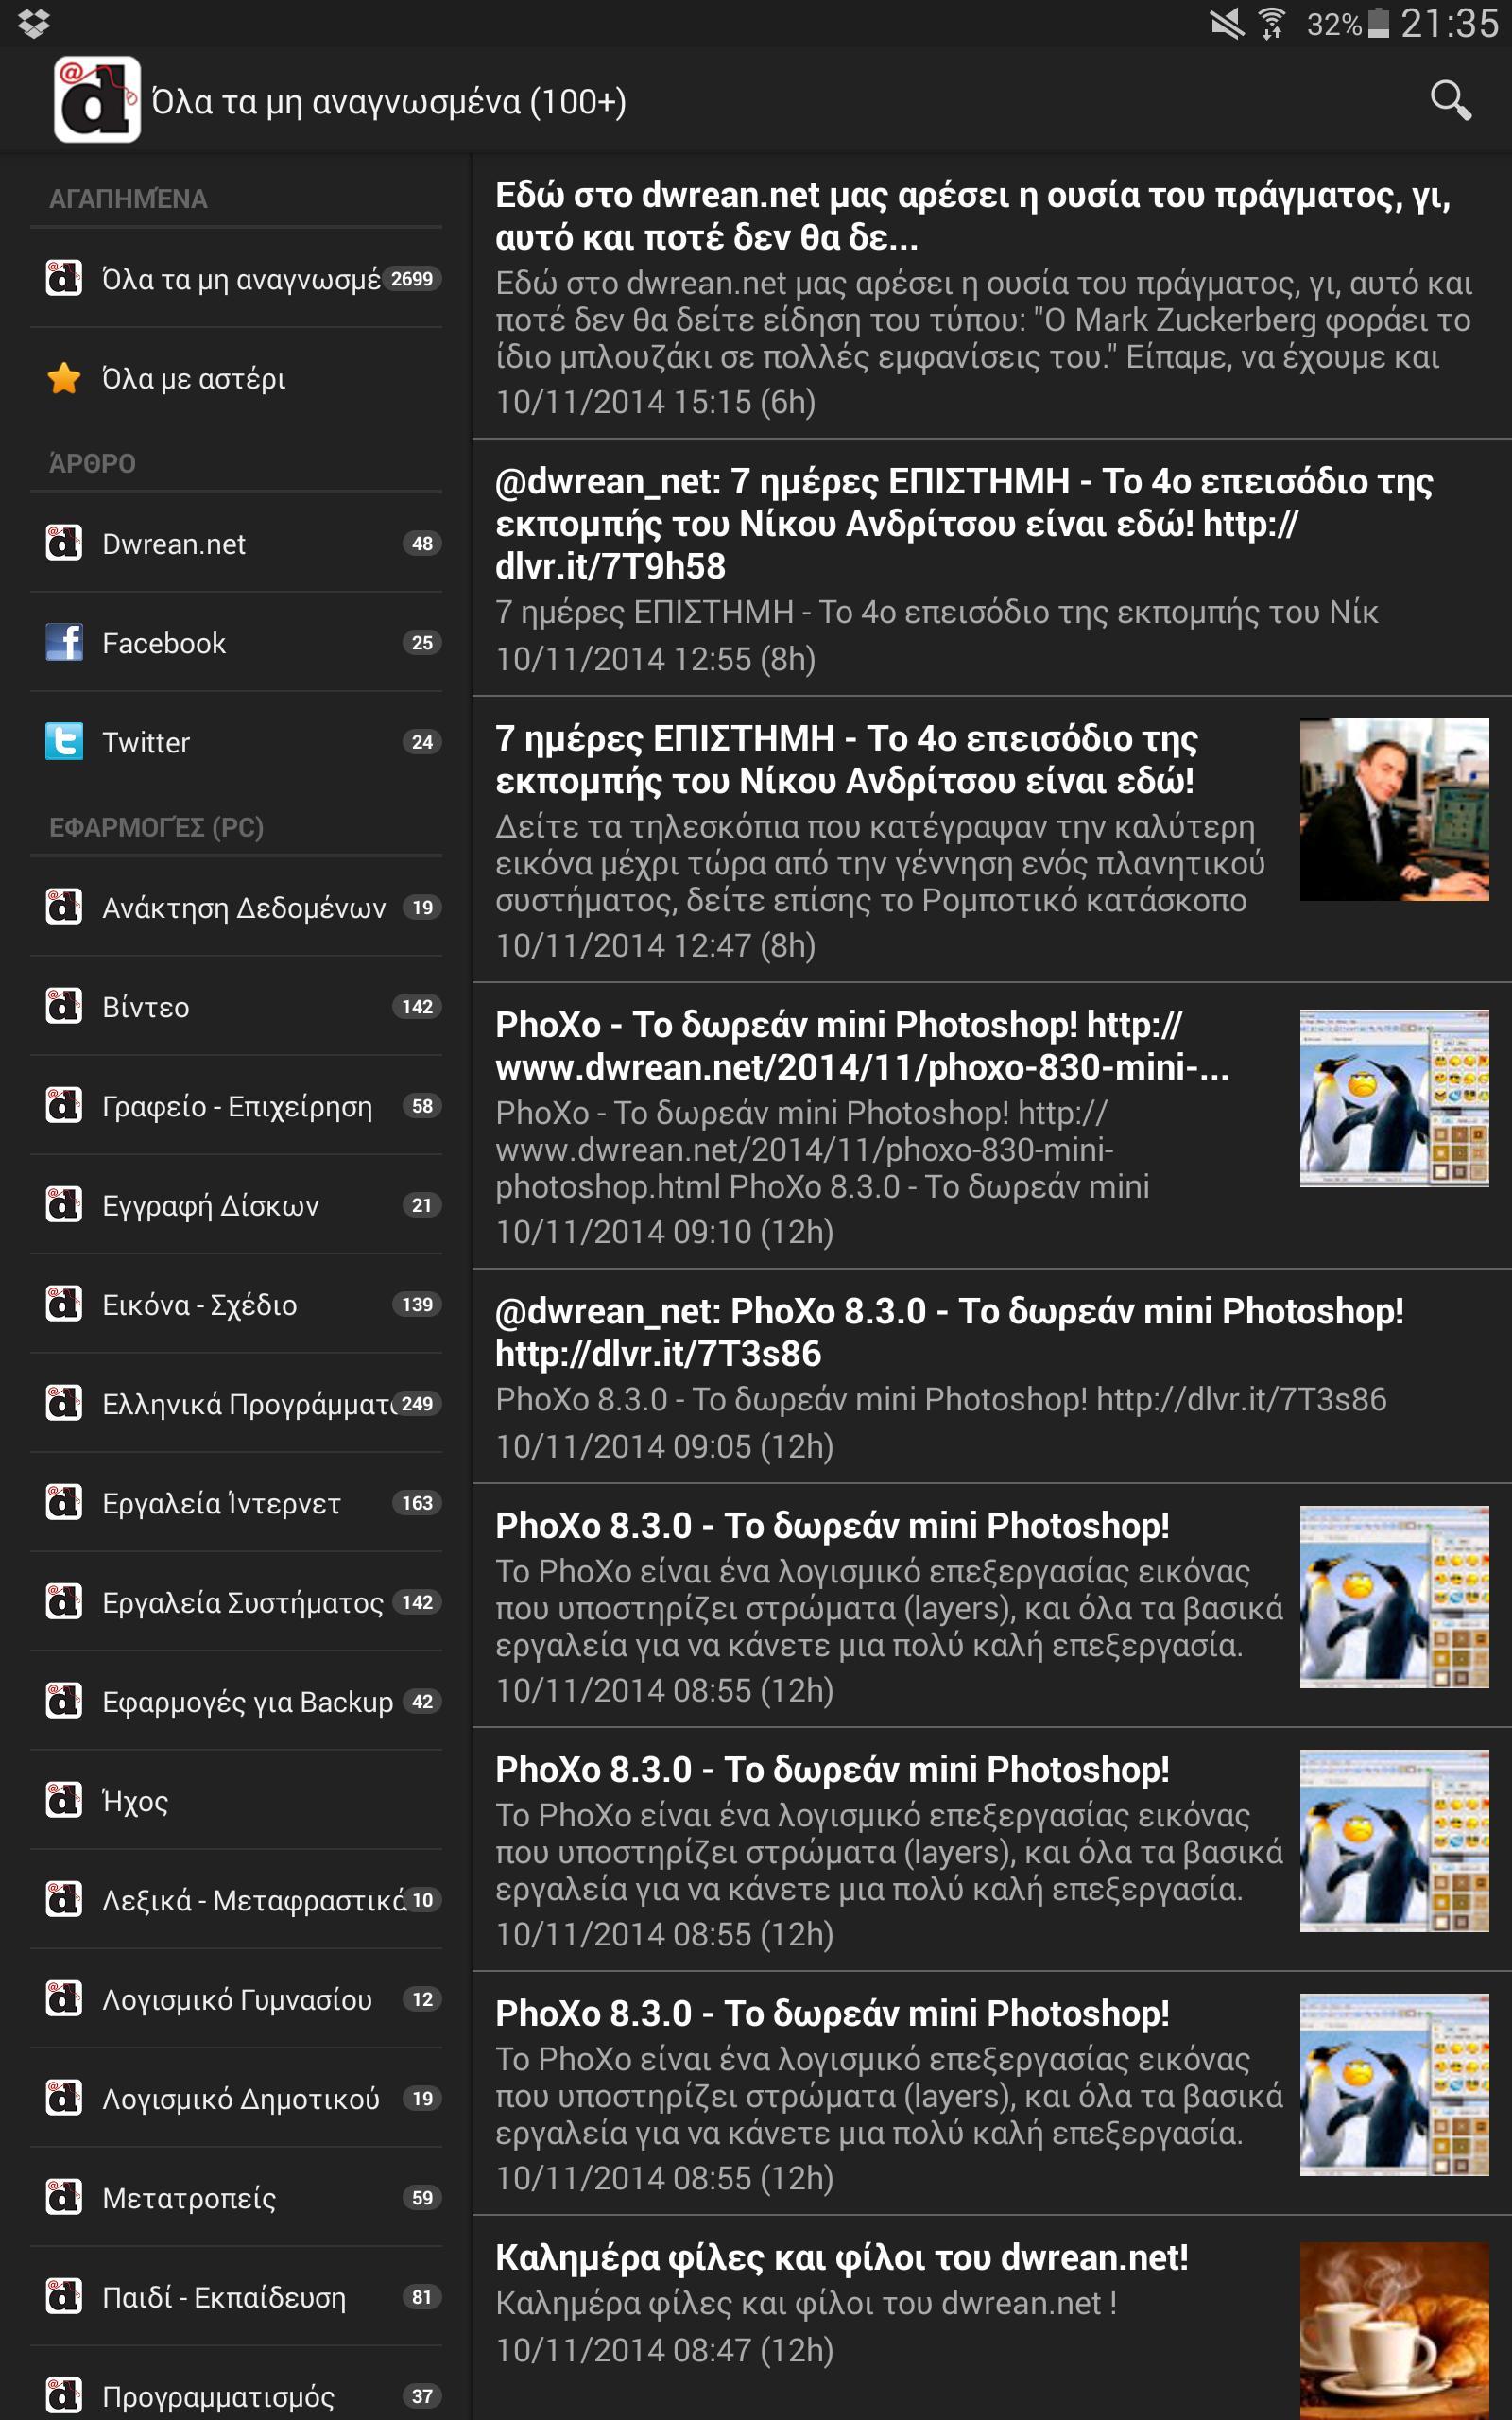 Dwrean.net (Δωρεάν.net) poster